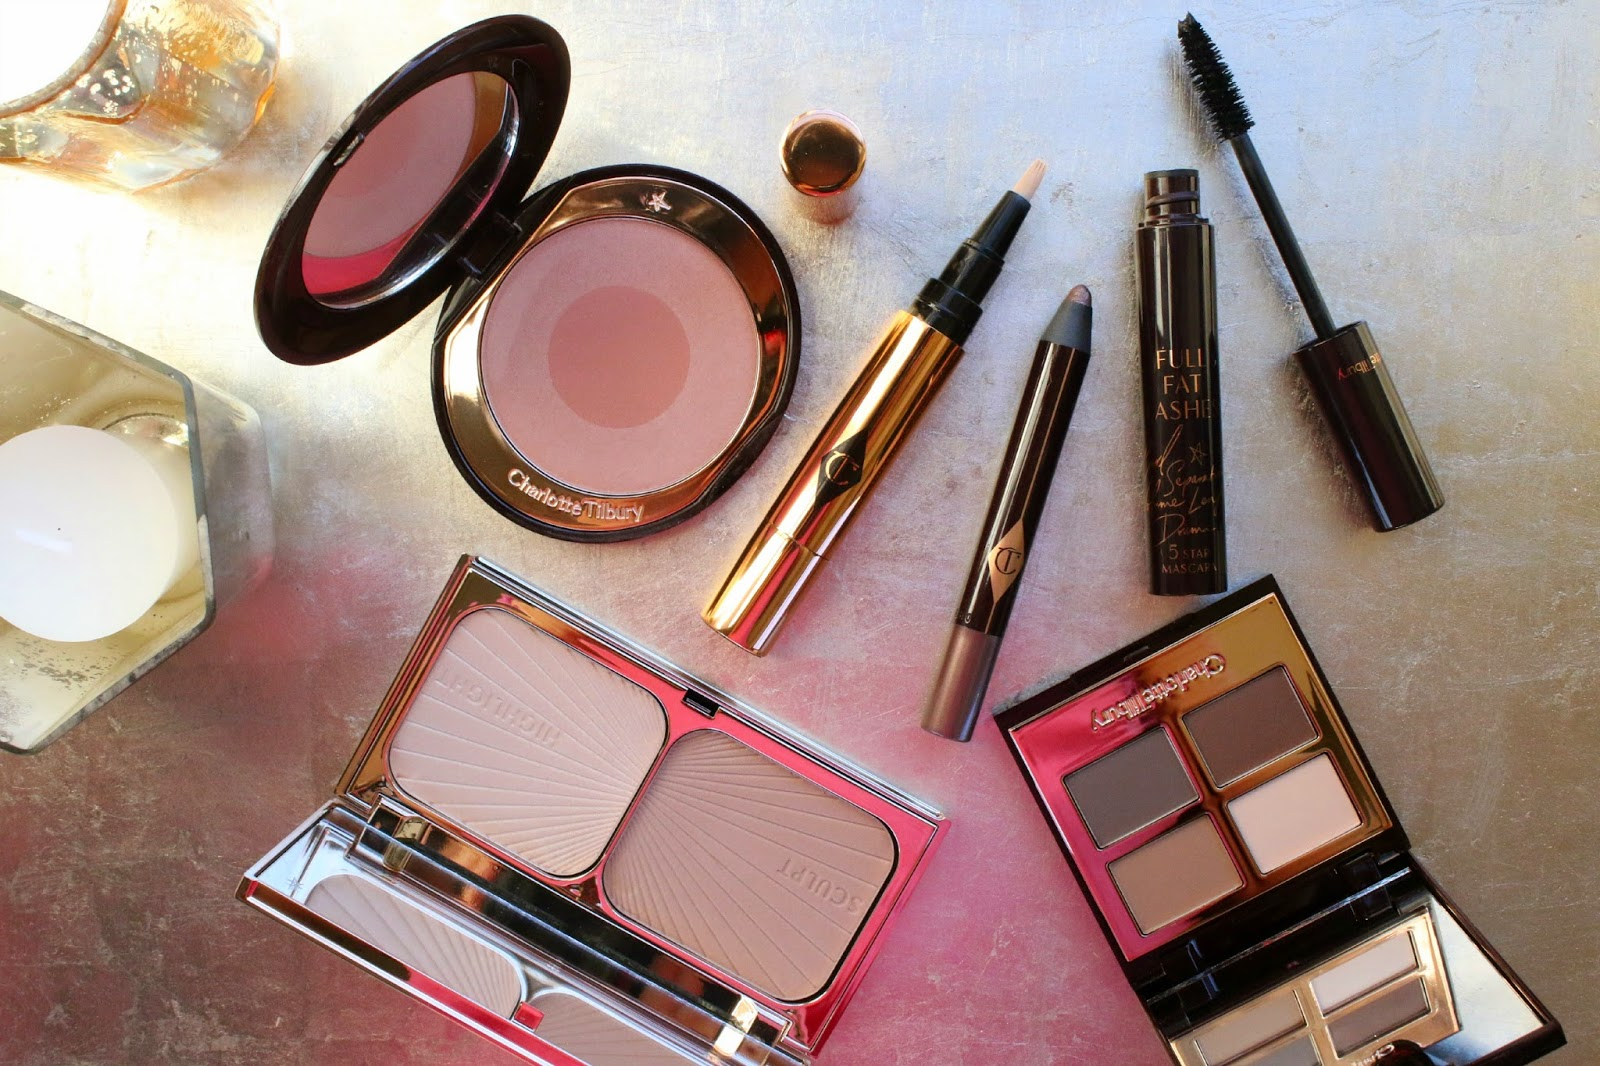 Charlotte Tilbury makeup review